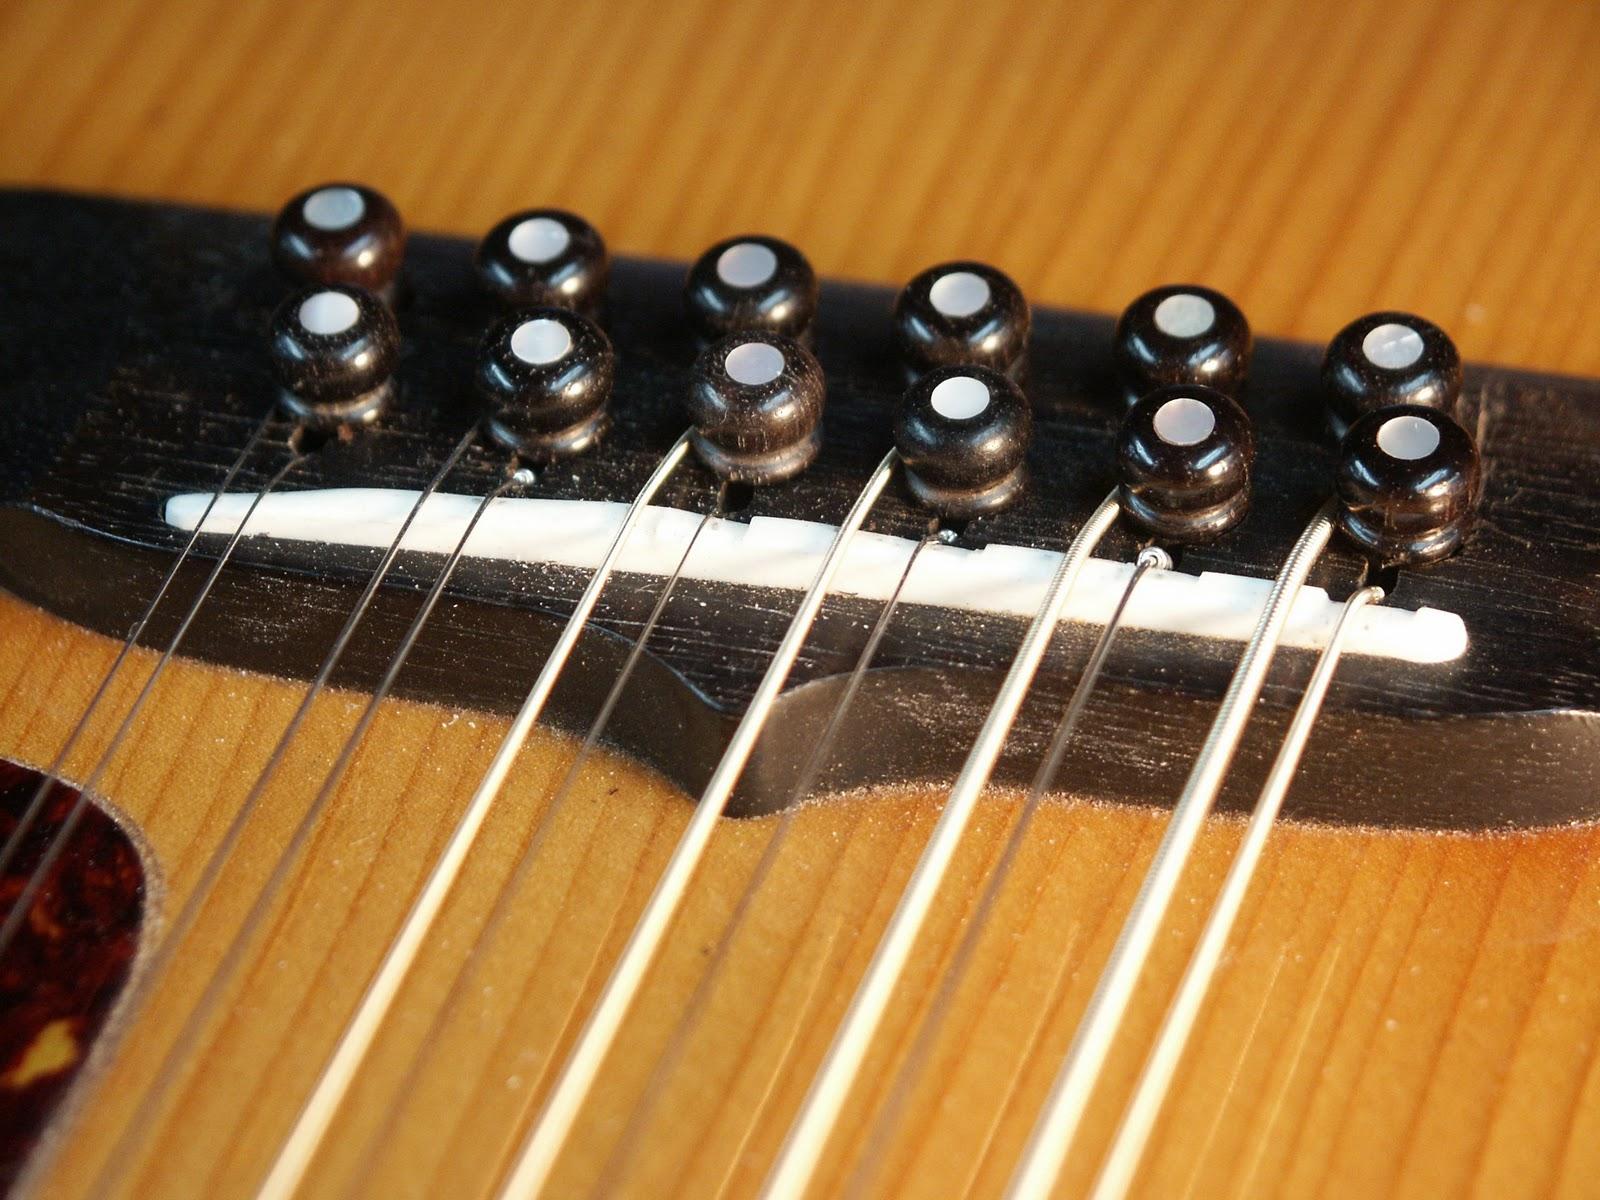 12 String Guitar Strings Order : mcconville guitars guitar repair and design courses guitar repair school guitar won 39 t stay ~ Hamham.info Haus und Dekorationen